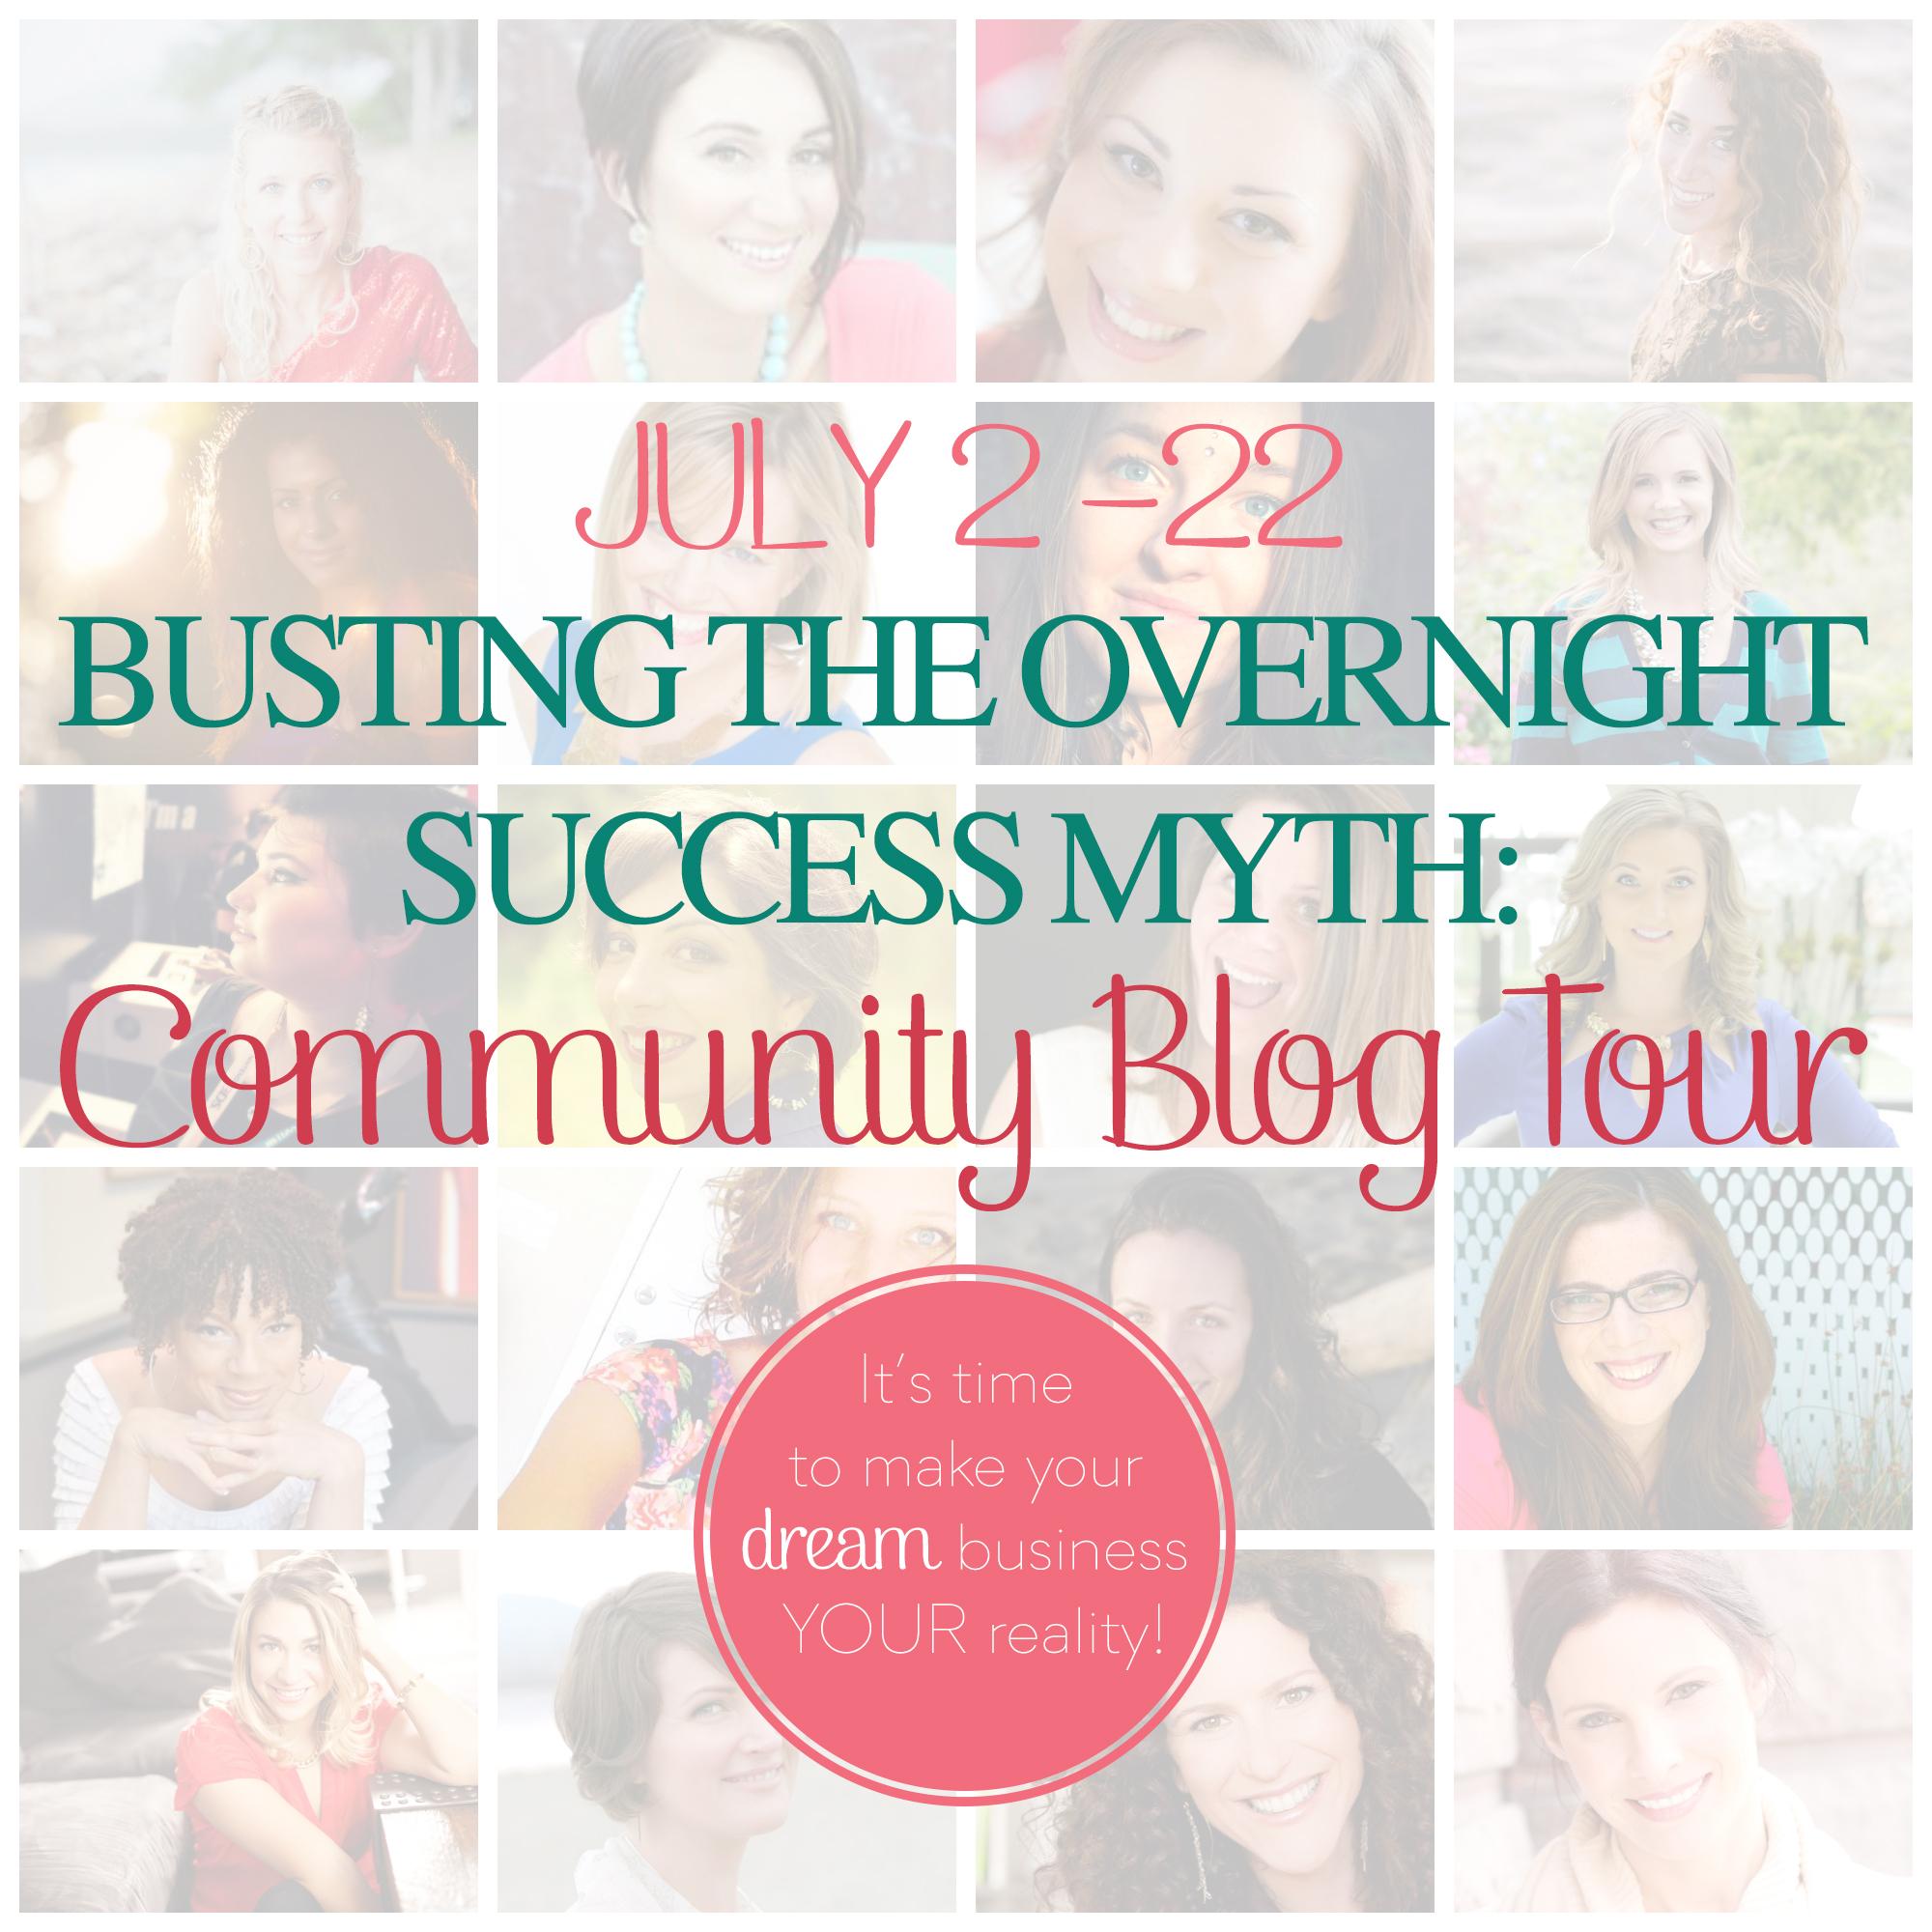 AB_CommunityBlogTour4_07.18.14